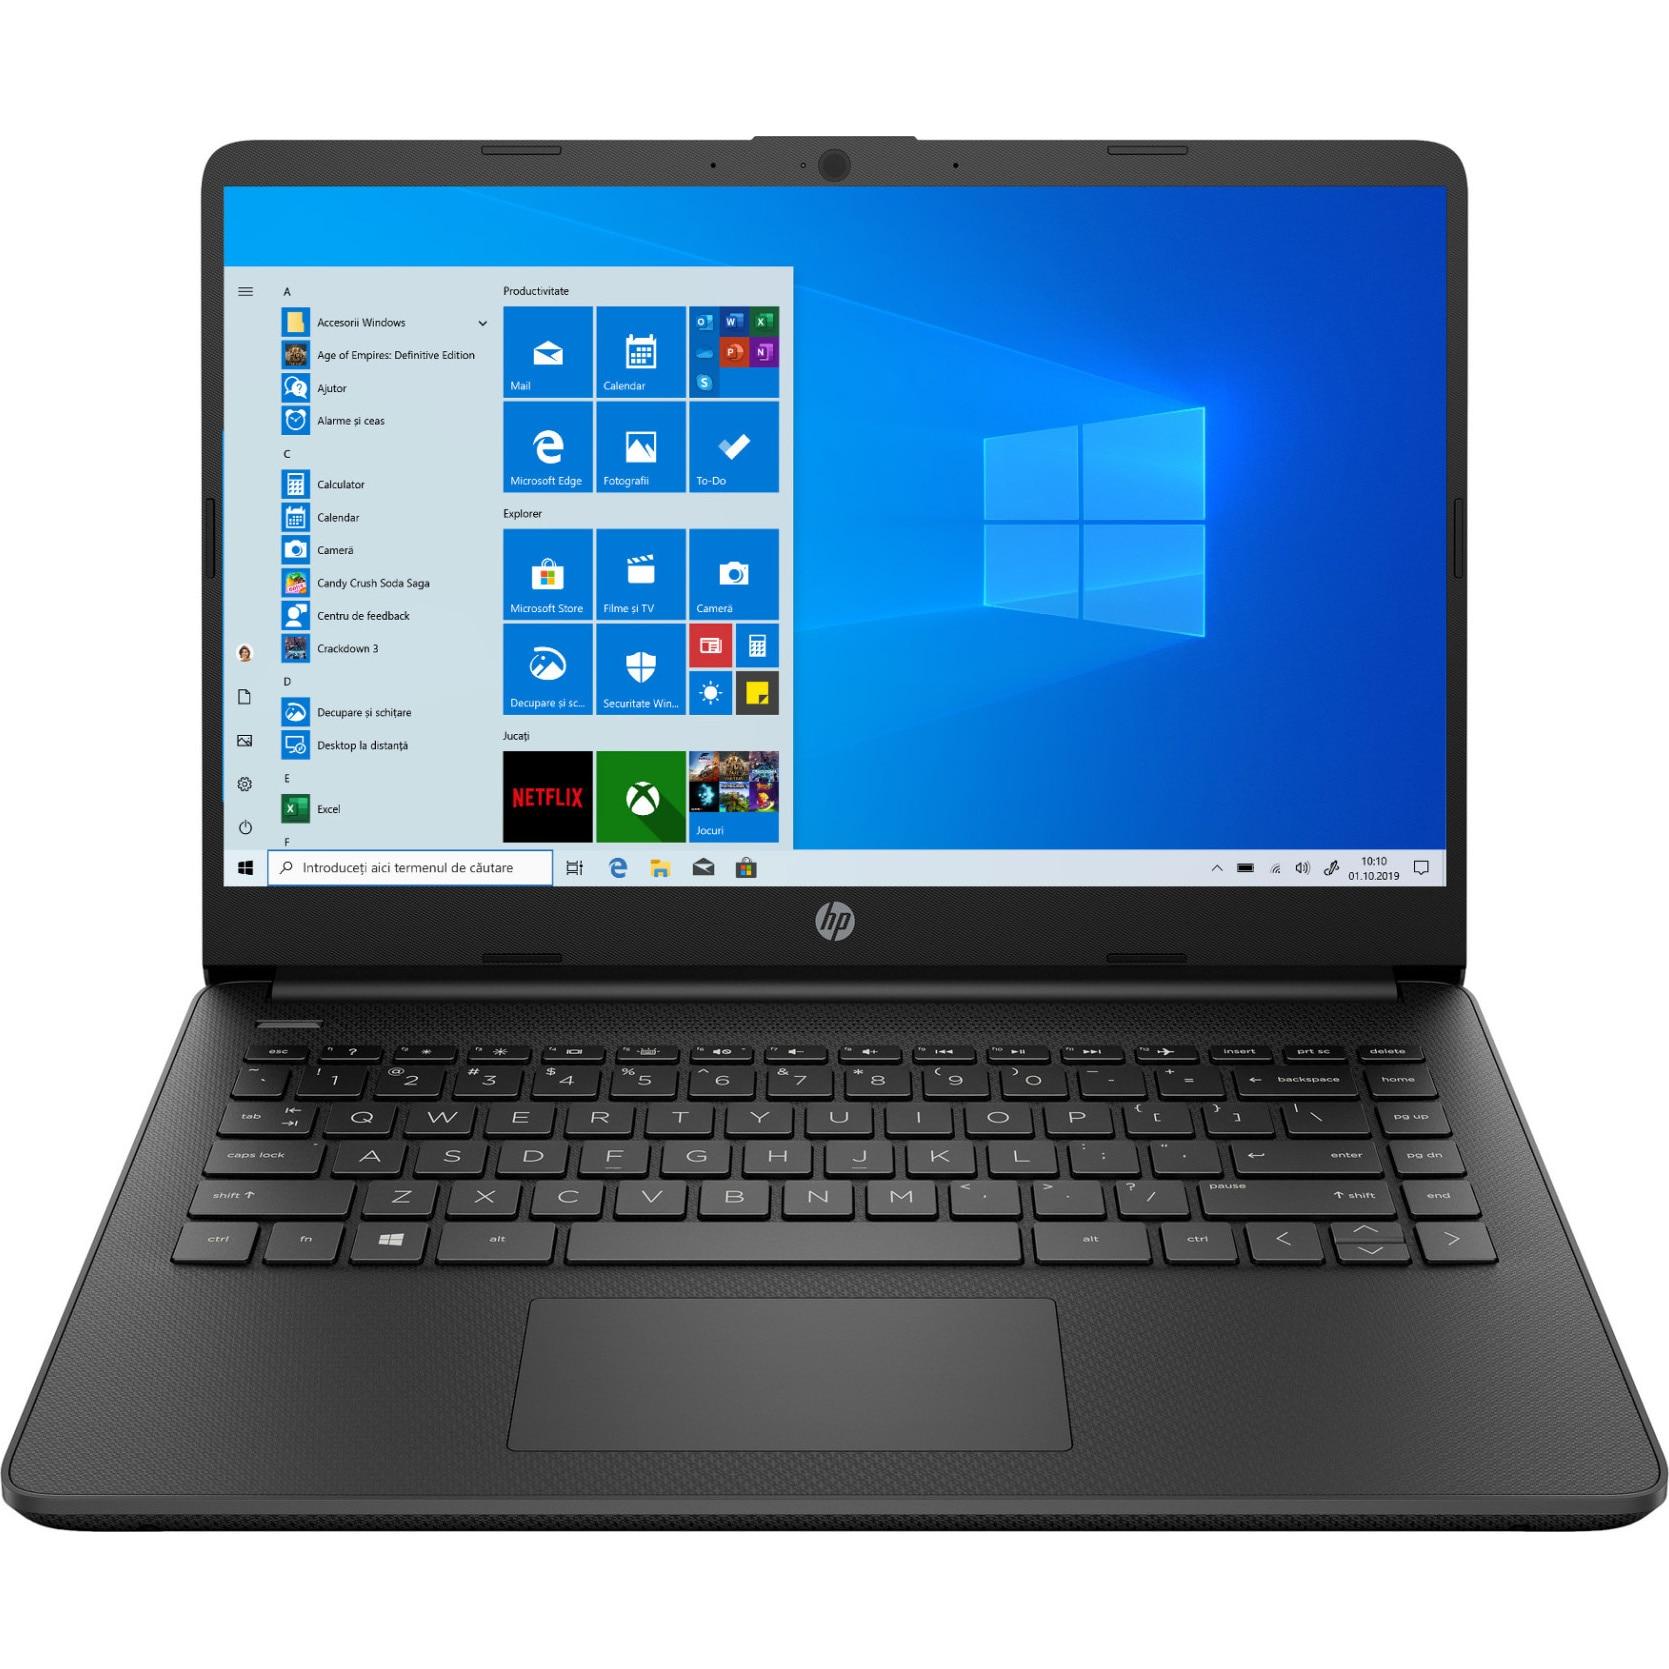 "Fotografie Laptop ultraportabil HP 14s-fq0710nd cu procesor AMD Athlon™ 3020e pana la 2.60 GHz, 14"", Full HD, 4GB, 64GB eMMC, AMD Radeon™ Graphics, Windows 10 Home S, Black"